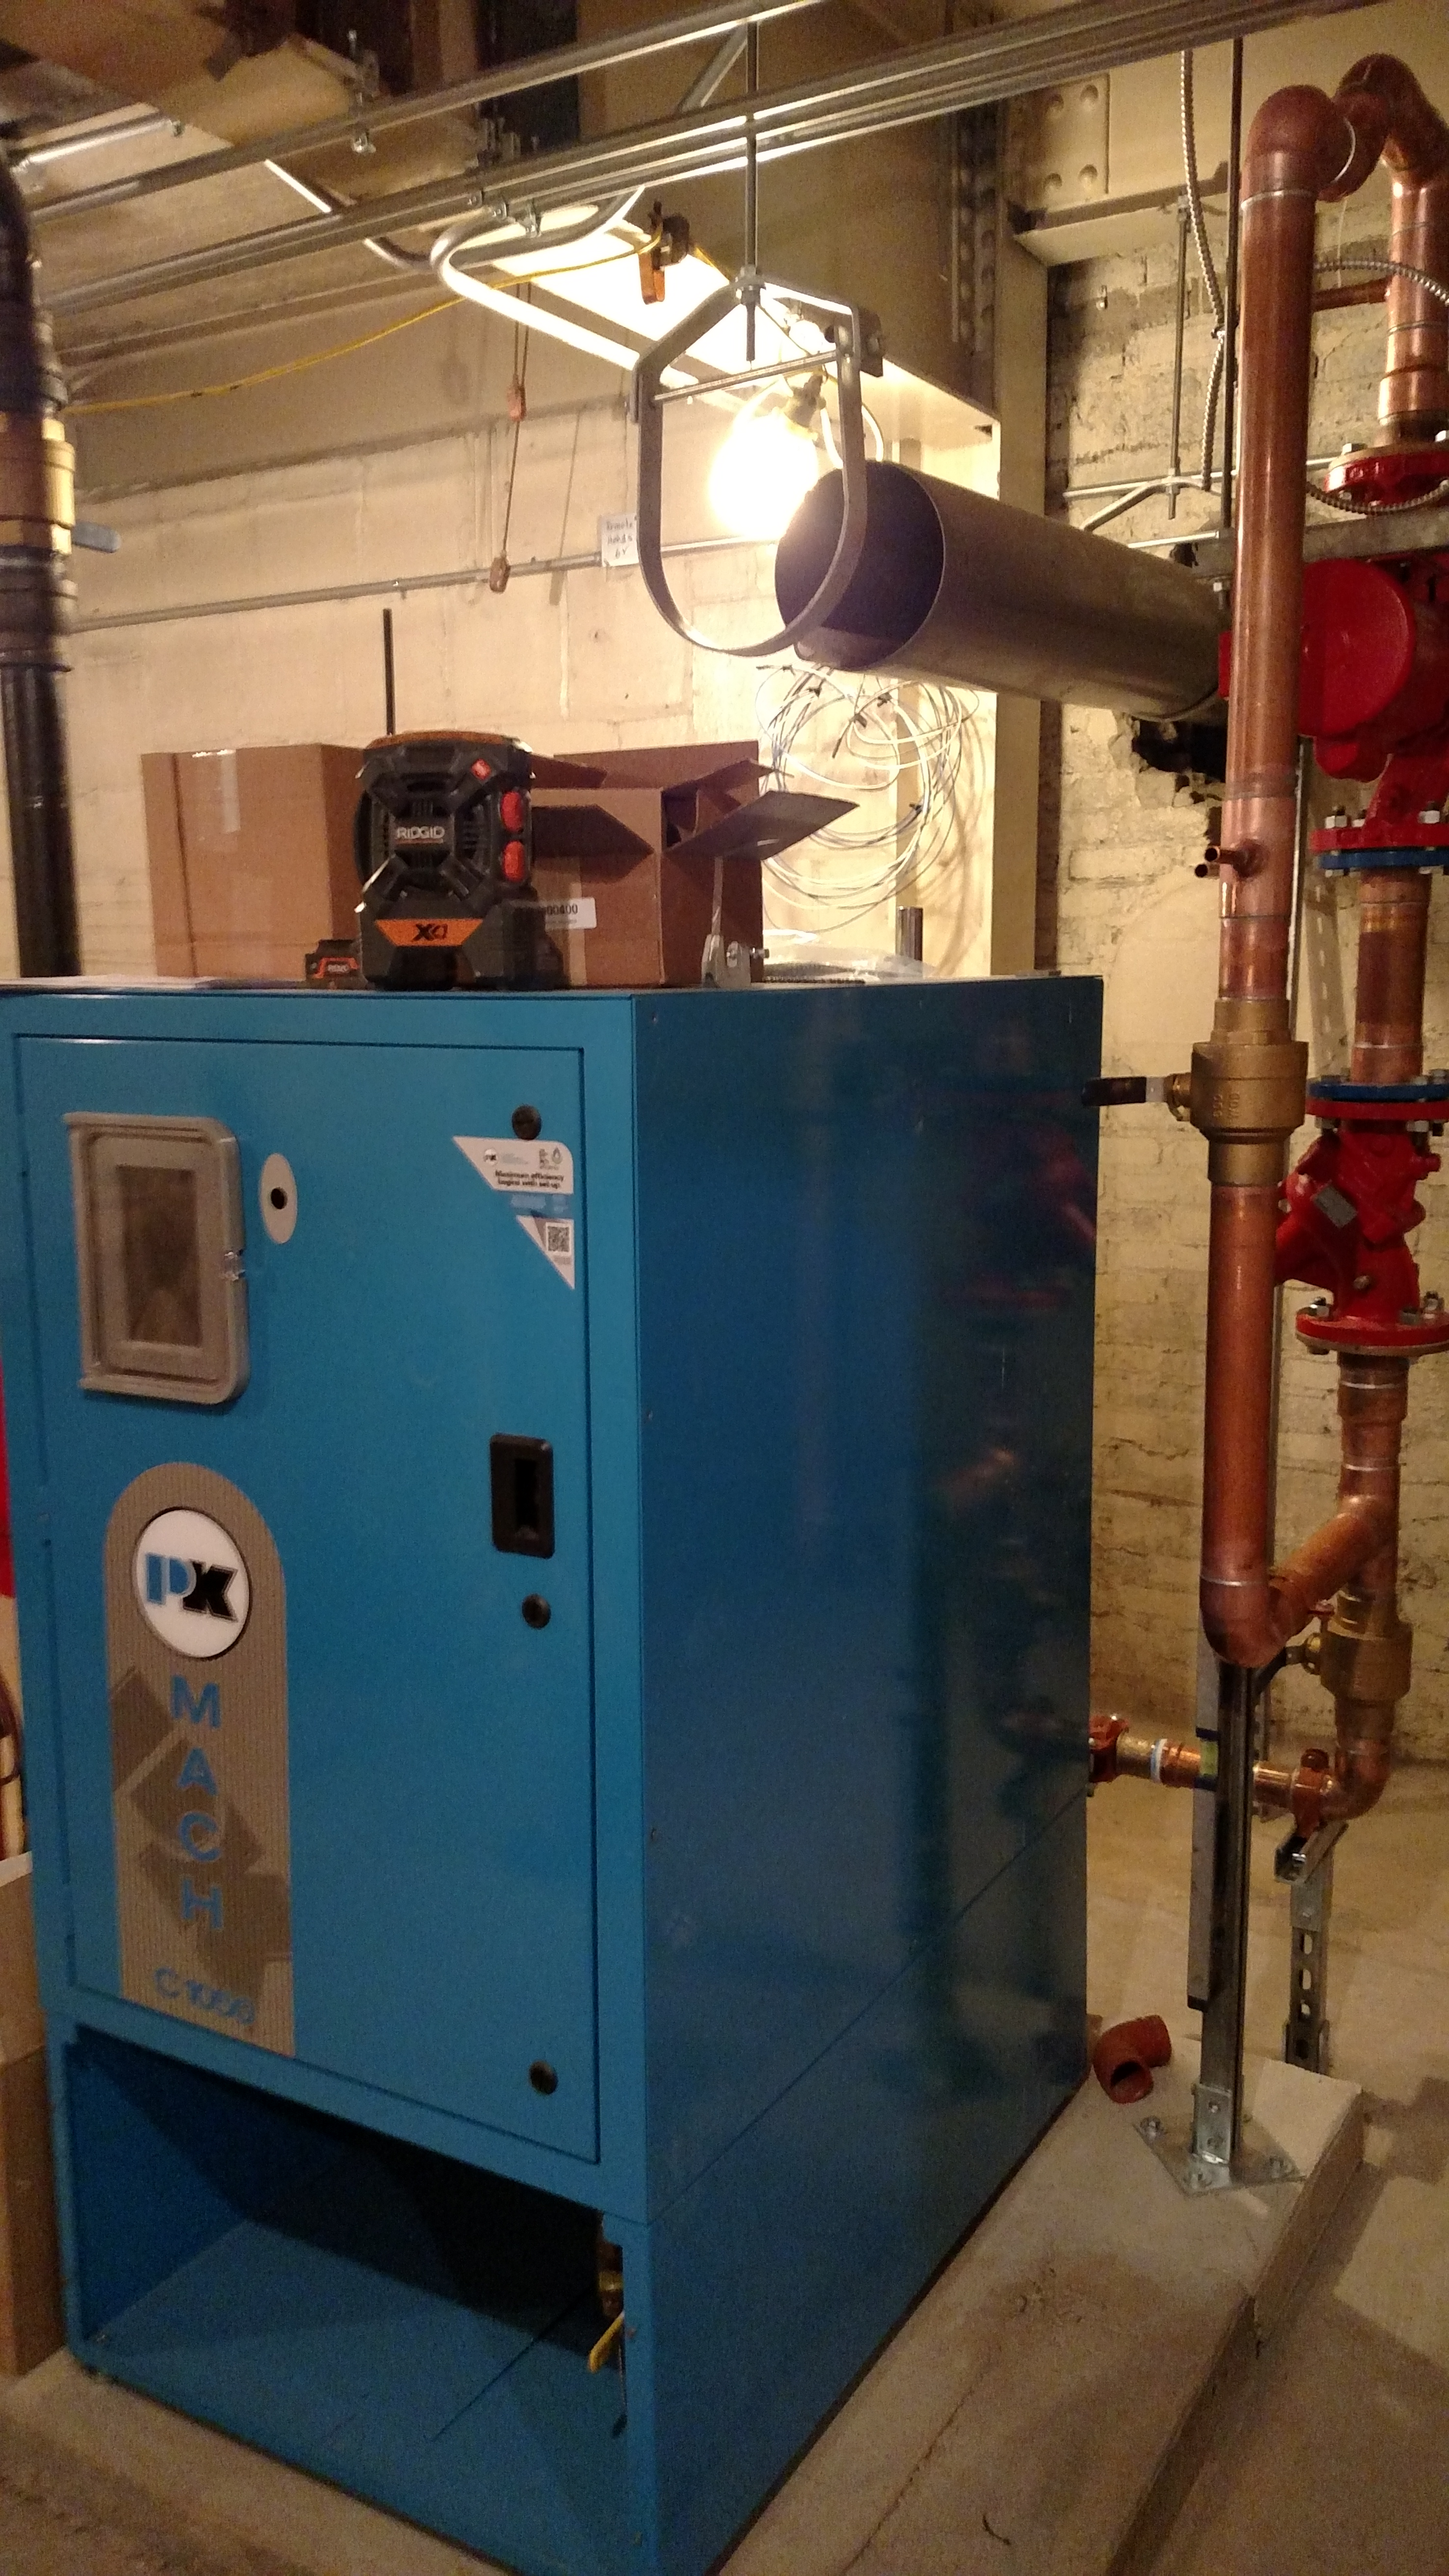 patterson-kelly boiler - stroudsburg